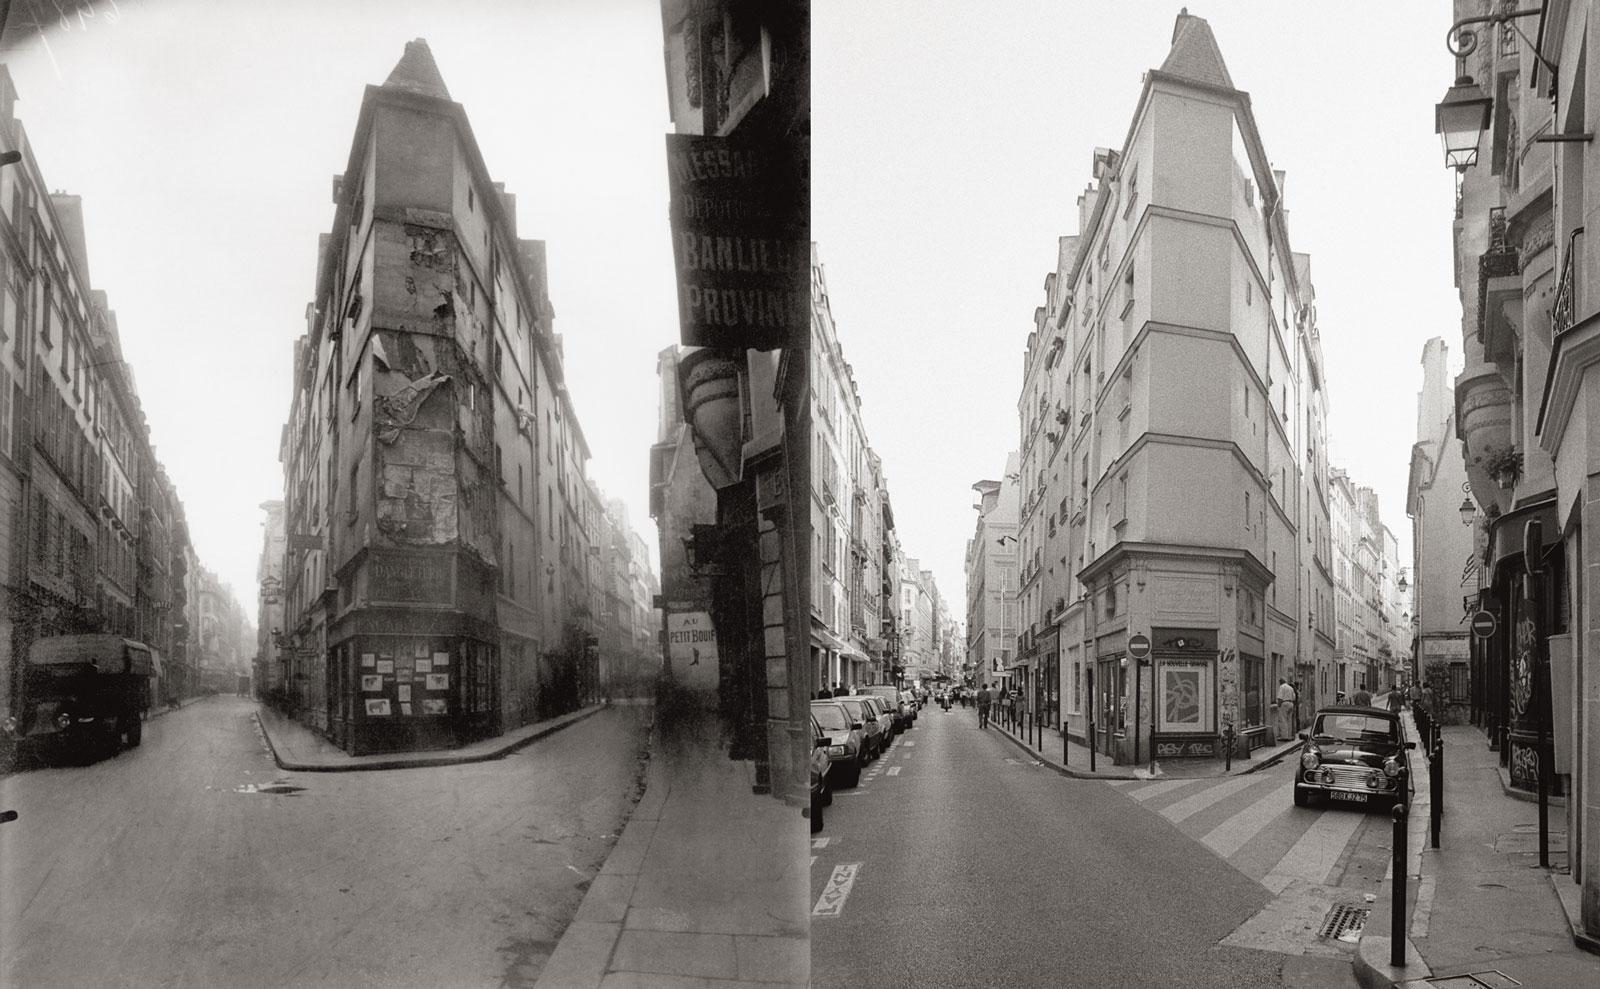 Intersection of rue de Seine and rue de l'Échaudé, circa 1924 by Eugène Atget (left), 1997 by Christopher Rauschenberg (right), from the new paperback edition of Christopher Rauschenberg's <em>Paris Changing: Revisiting Eugène Atget's Paris</em>, 2016